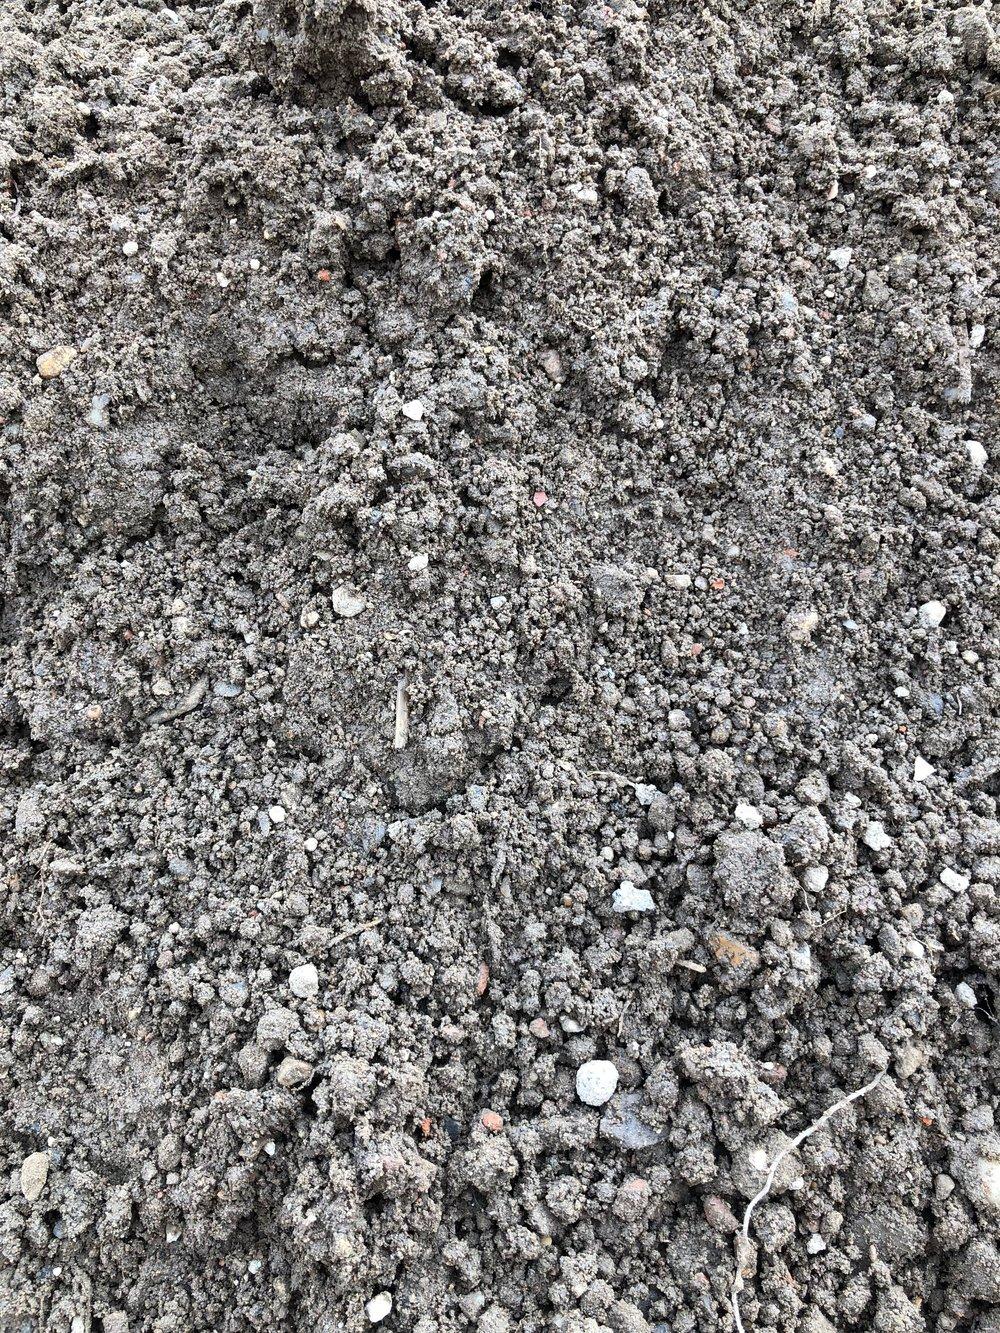 WASTE SUB SOIL -